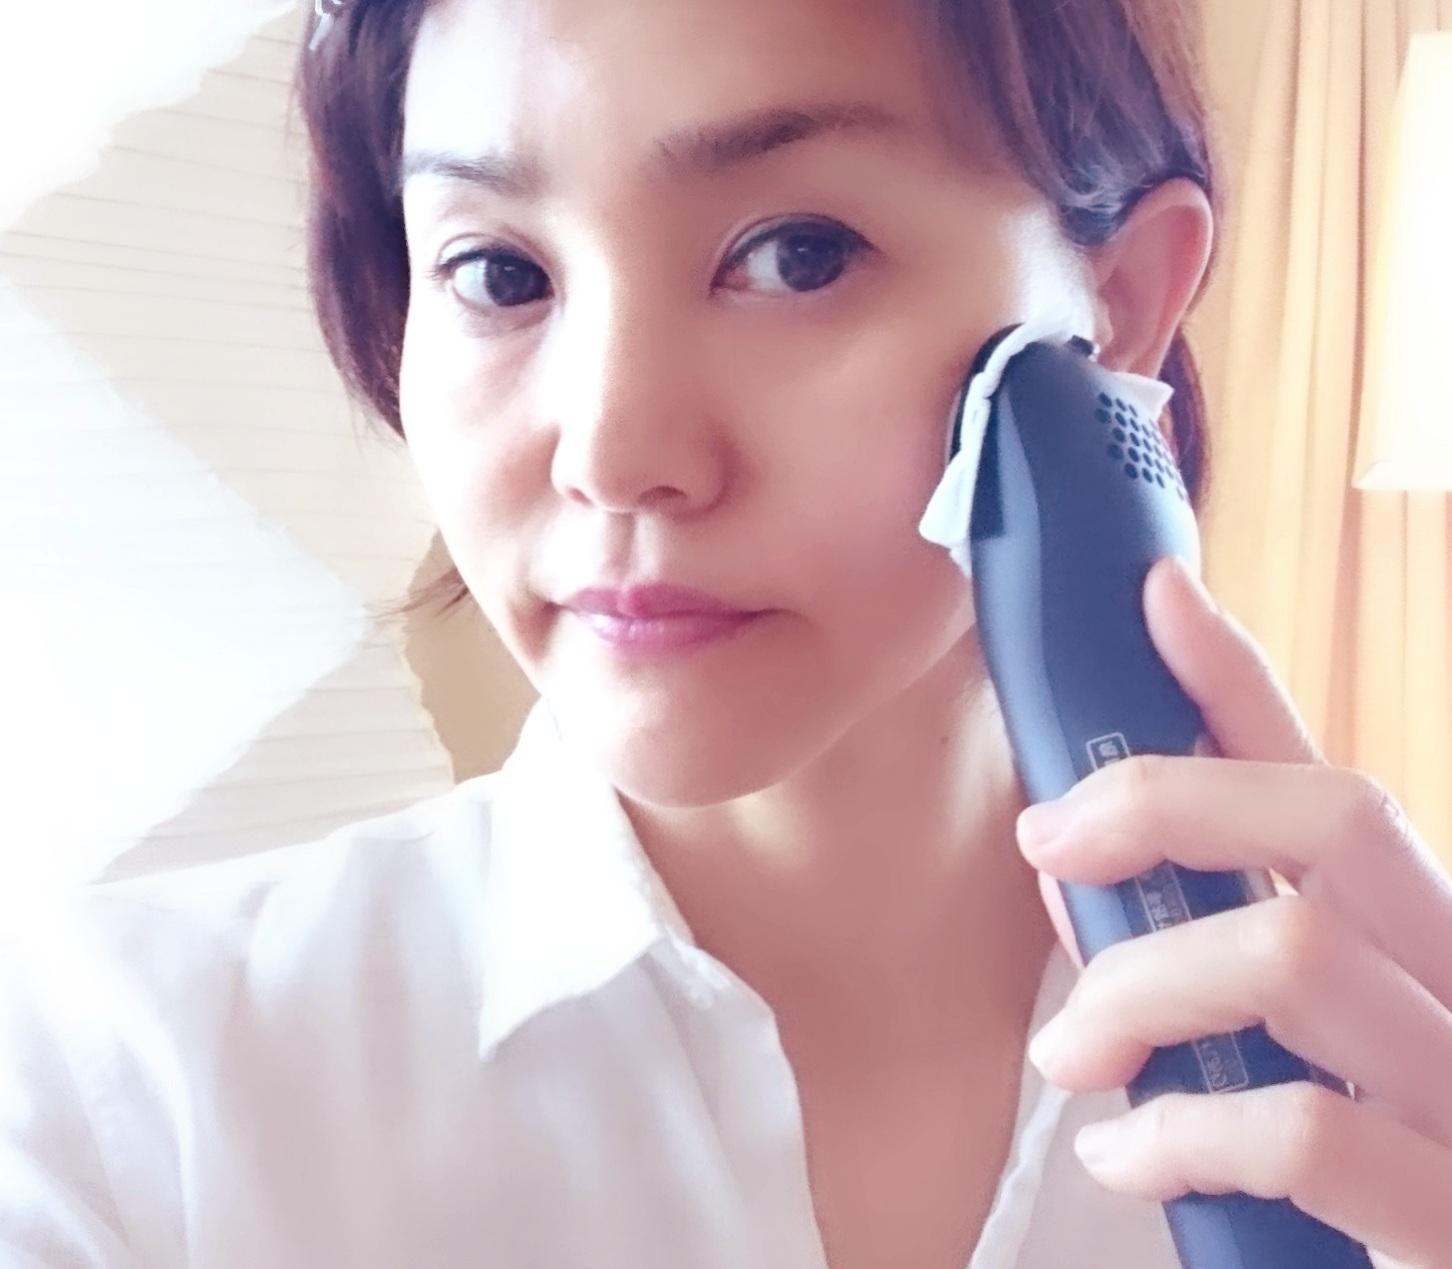 Panasonicから発売の美容家電&高機能化粧品を体験_1_1